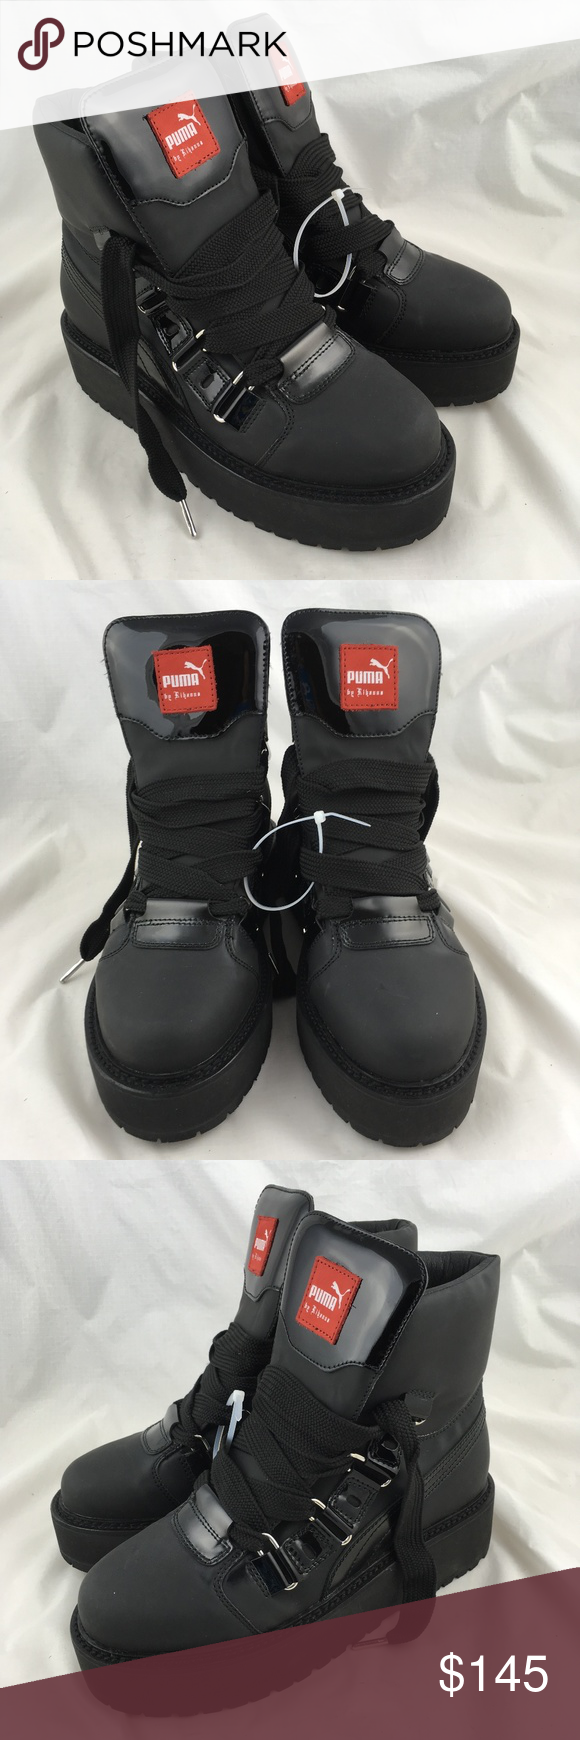 6efc5afd89e Fenty Puma sneaker boots black platform shoes NWOB Fenty PUMA by Rihanna  unisex Sneaker Boots